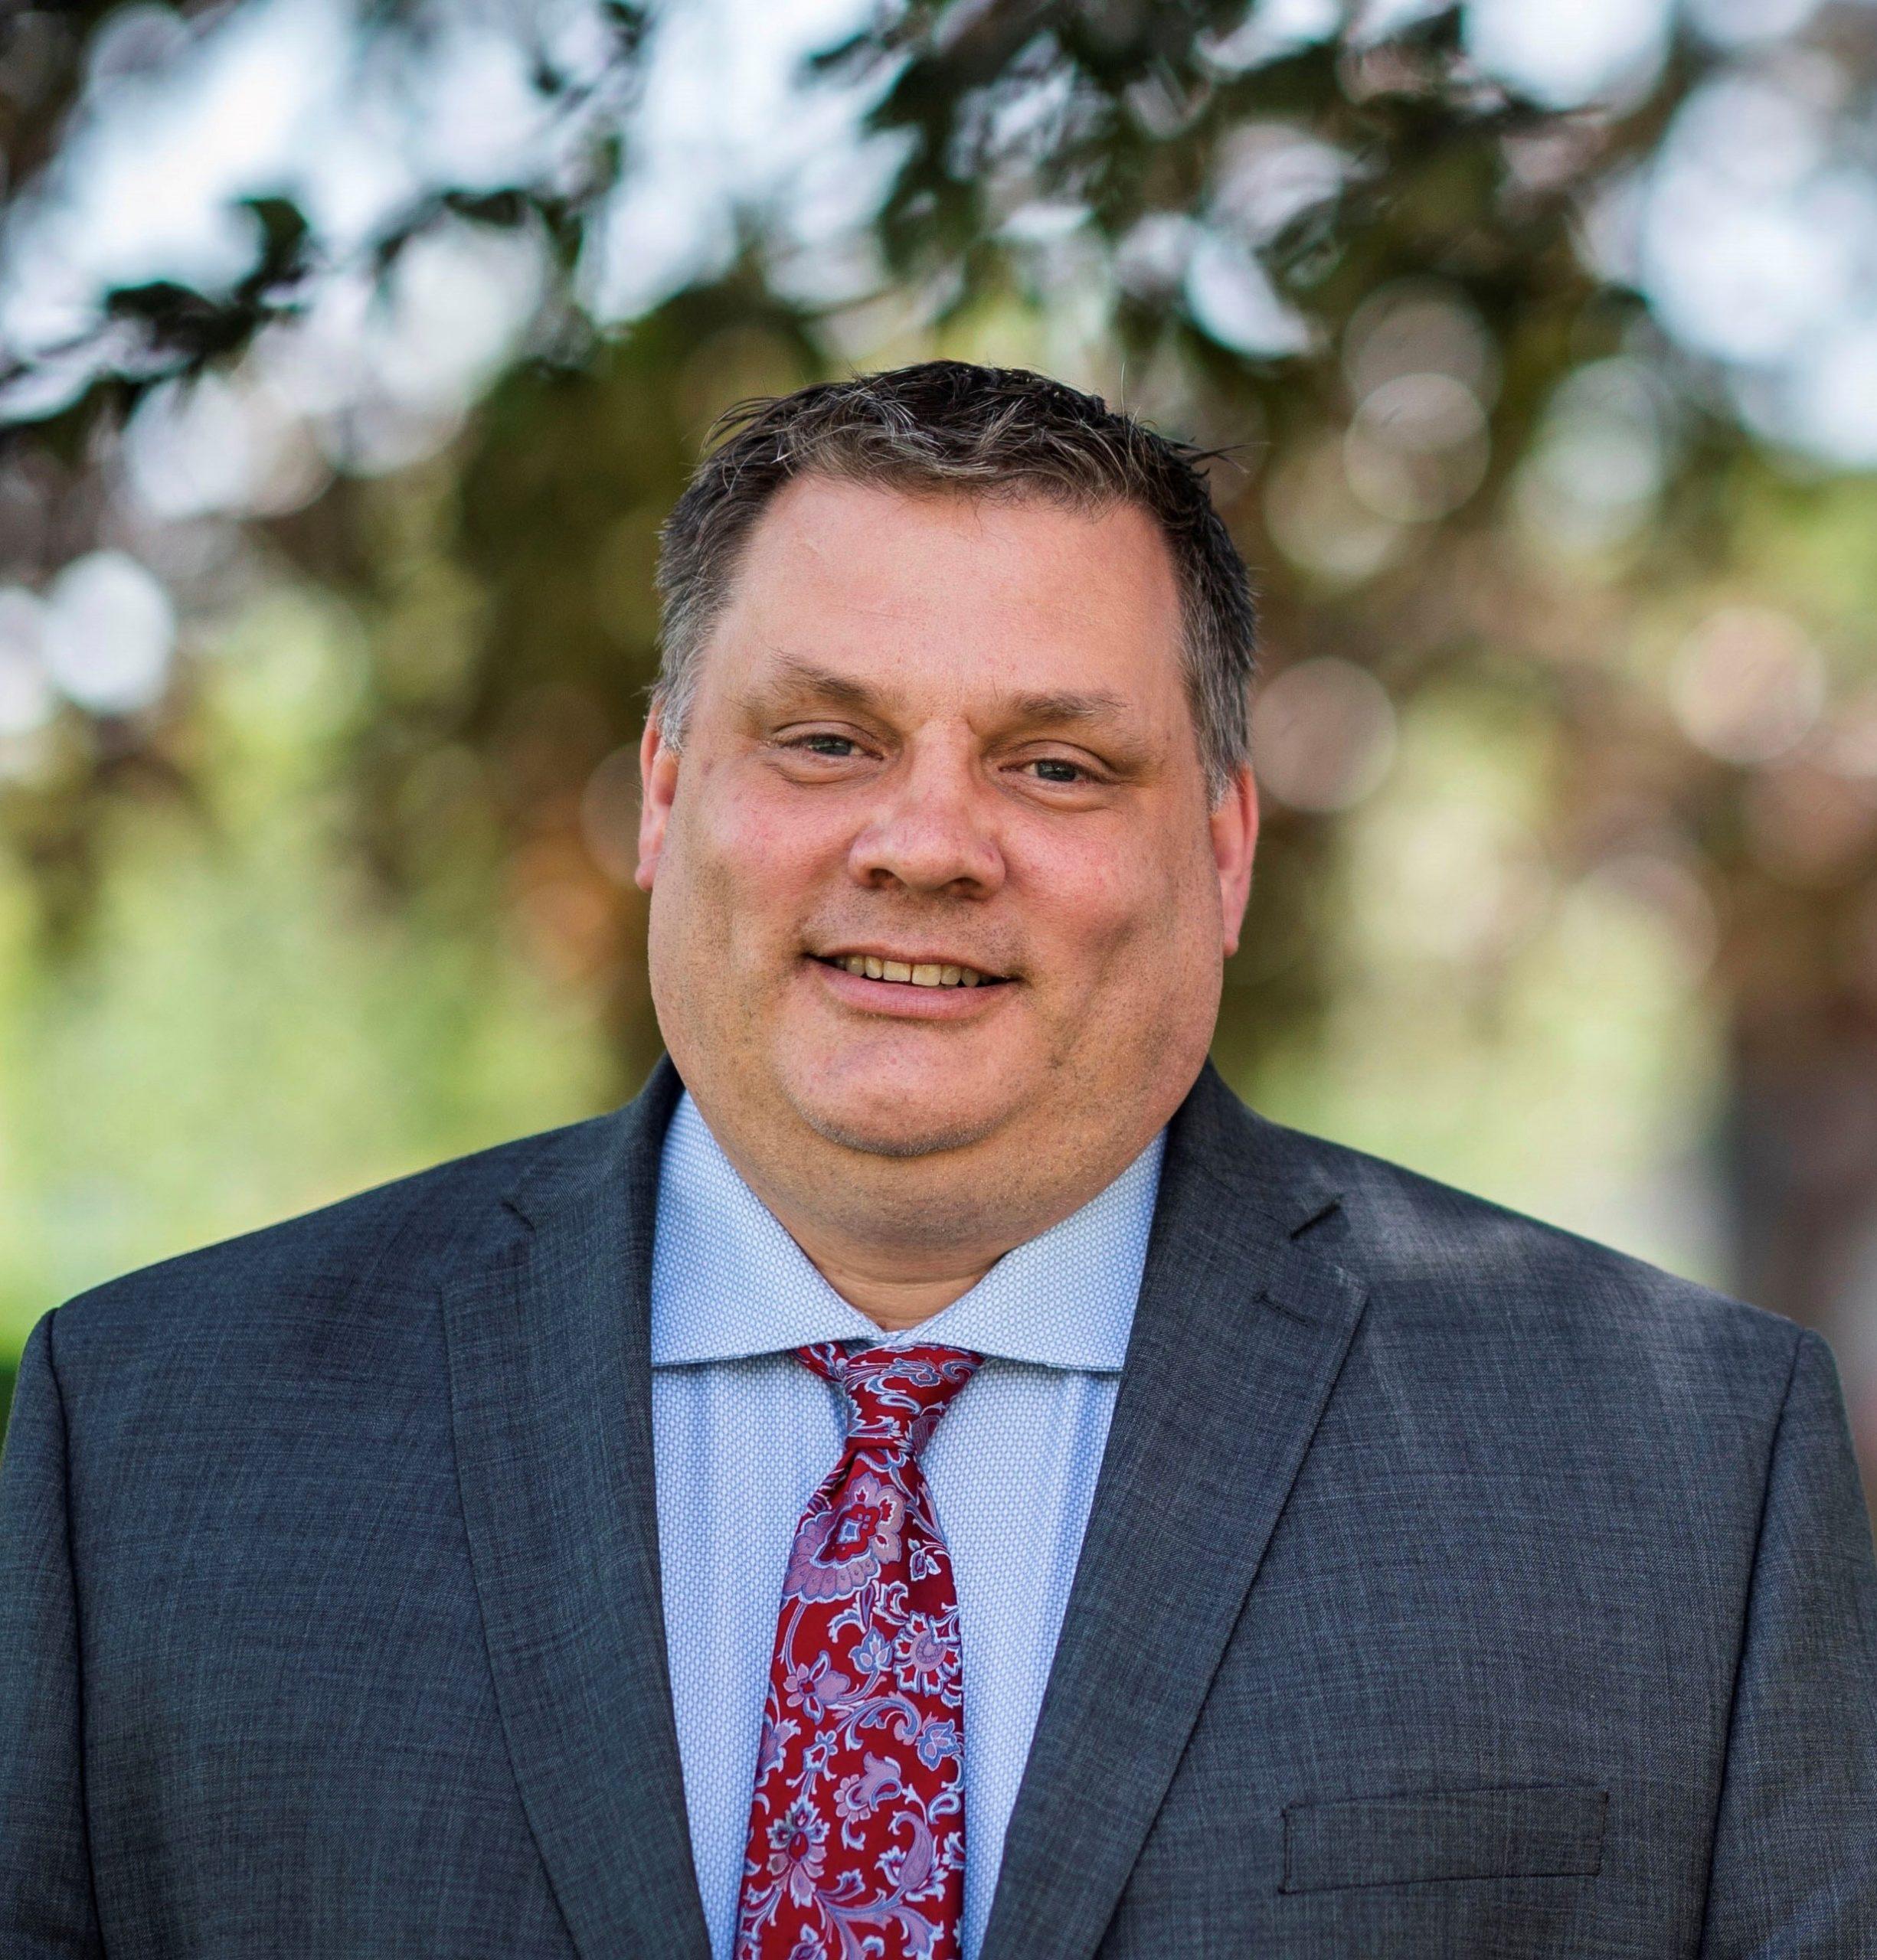 Kamloops Liberal MLA Peter Milobar Says BC Climate Plan Lacks Details